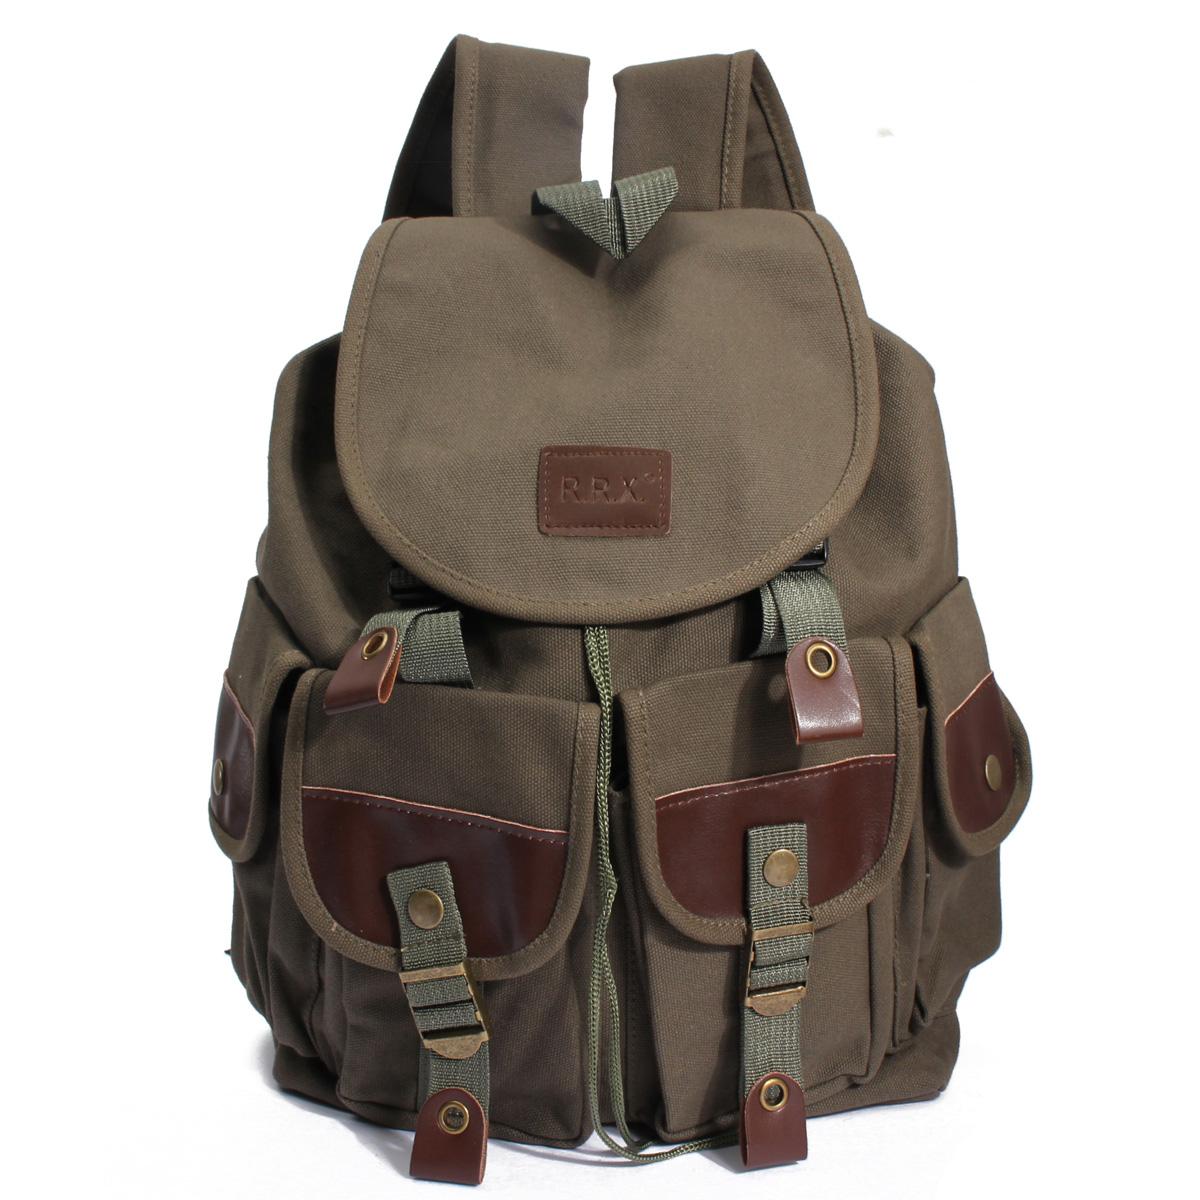 New Men Women Canvas Backpack Travel Camping School Satchel Military Hiking Bag